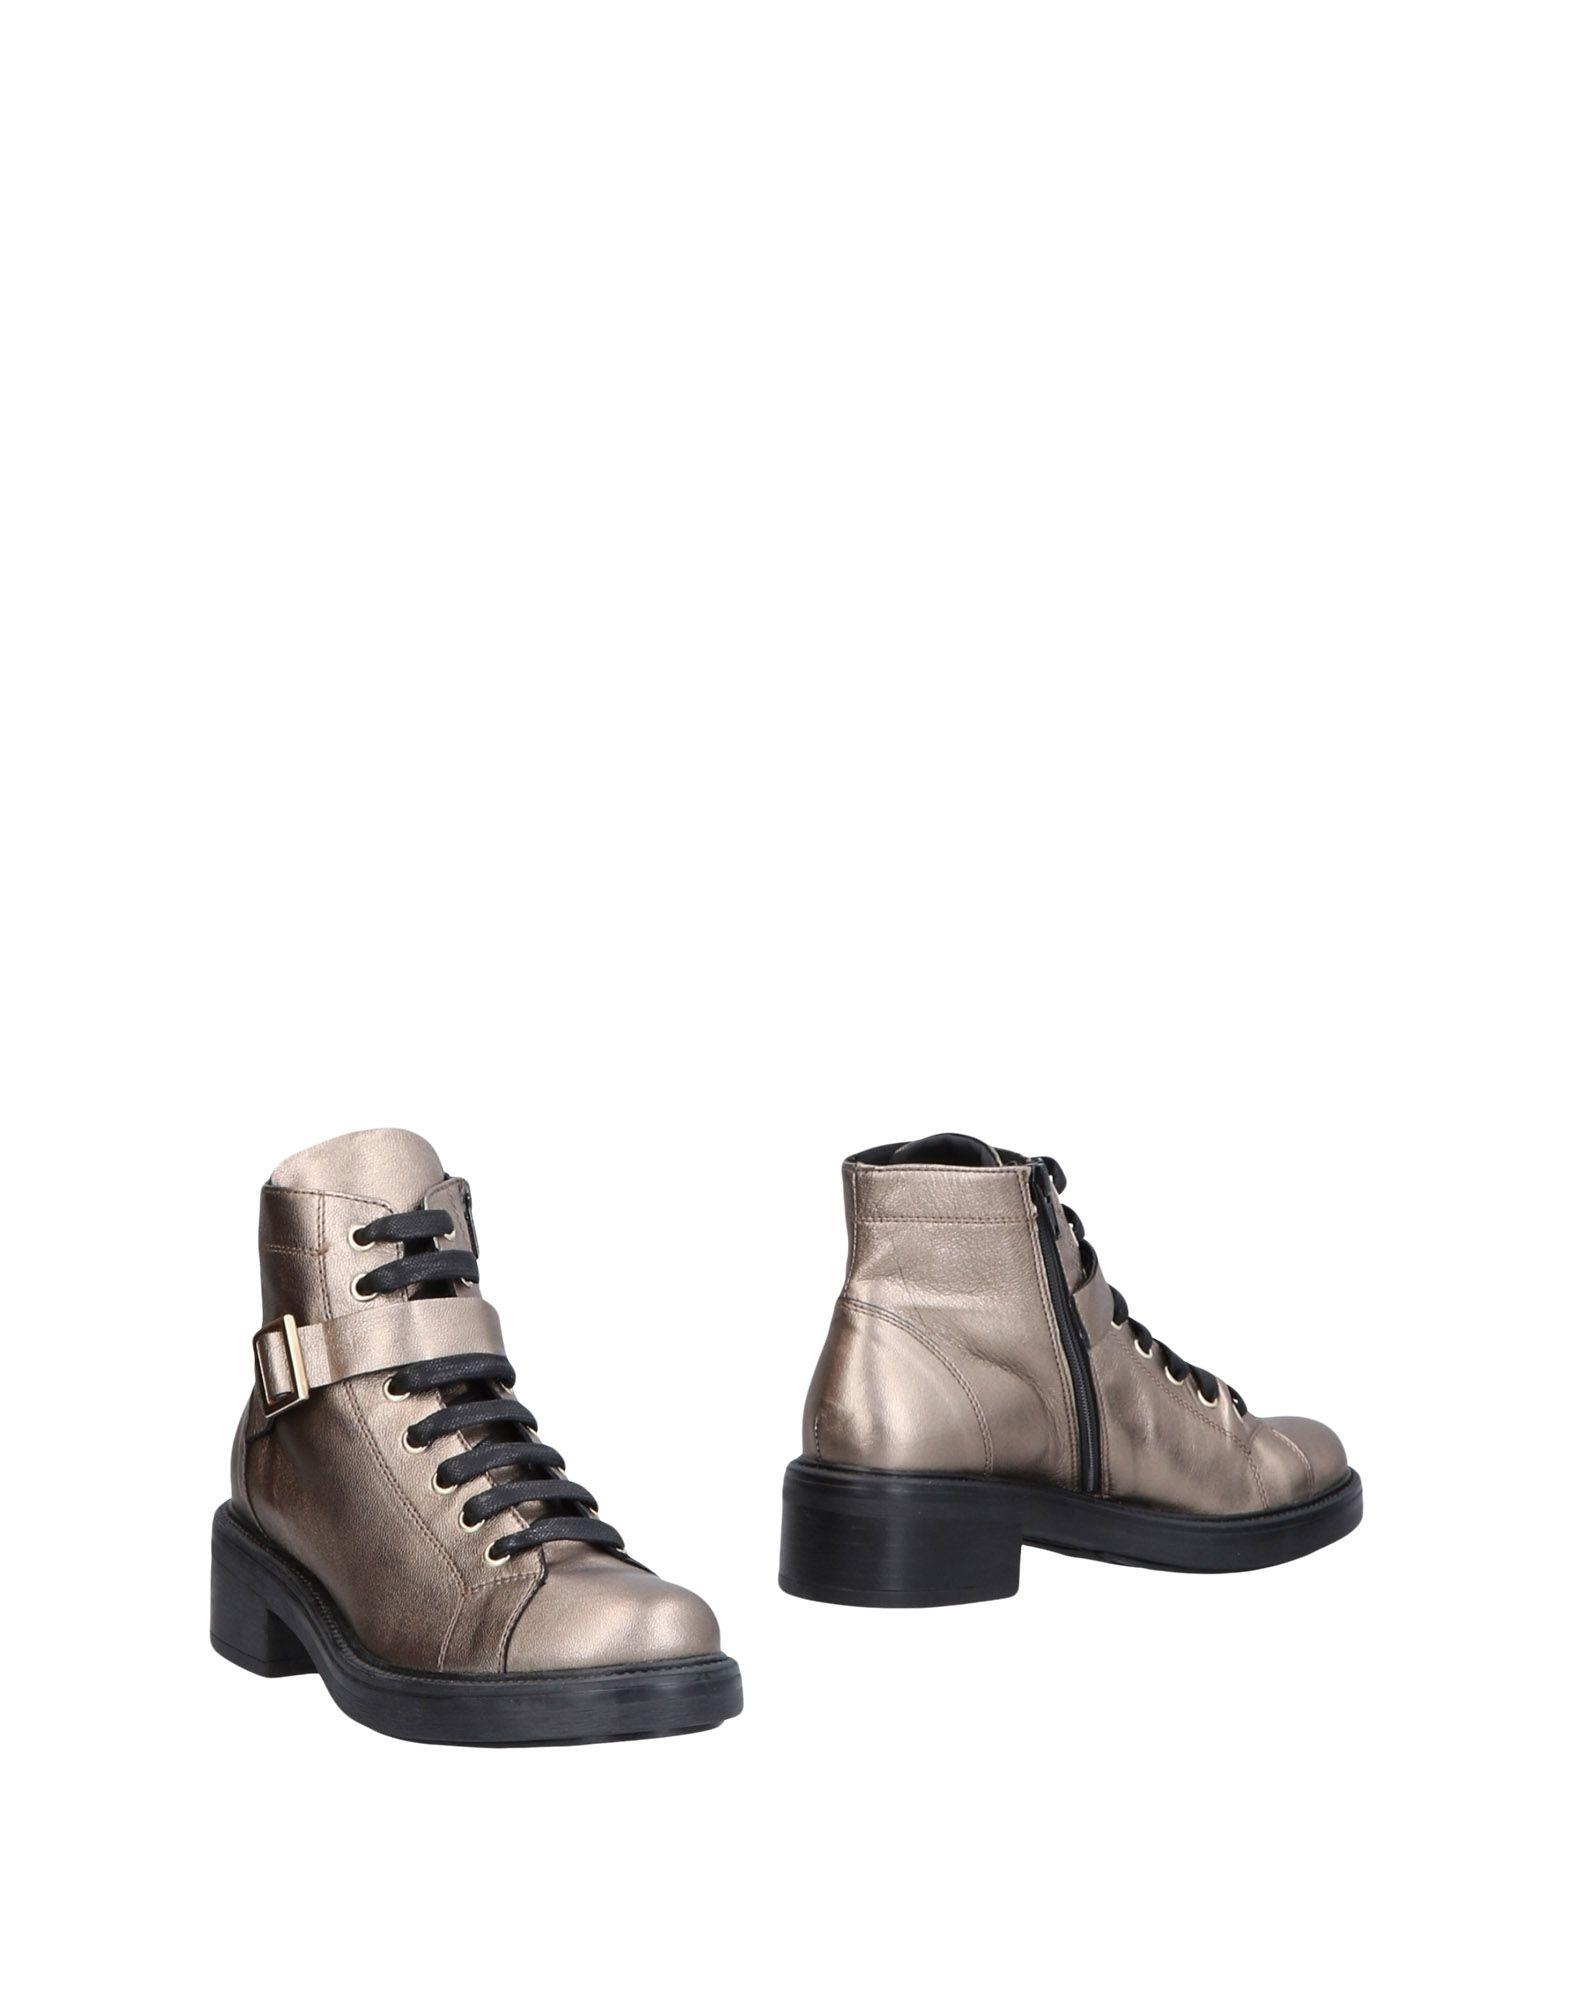 Фото - TOSCA BLU SHOES Полусапоги и высокие ботинки women high heel shoes platform pumps woman thin high heels party wedding shoes ladies kitten heels plus size 34 40 41 42 43